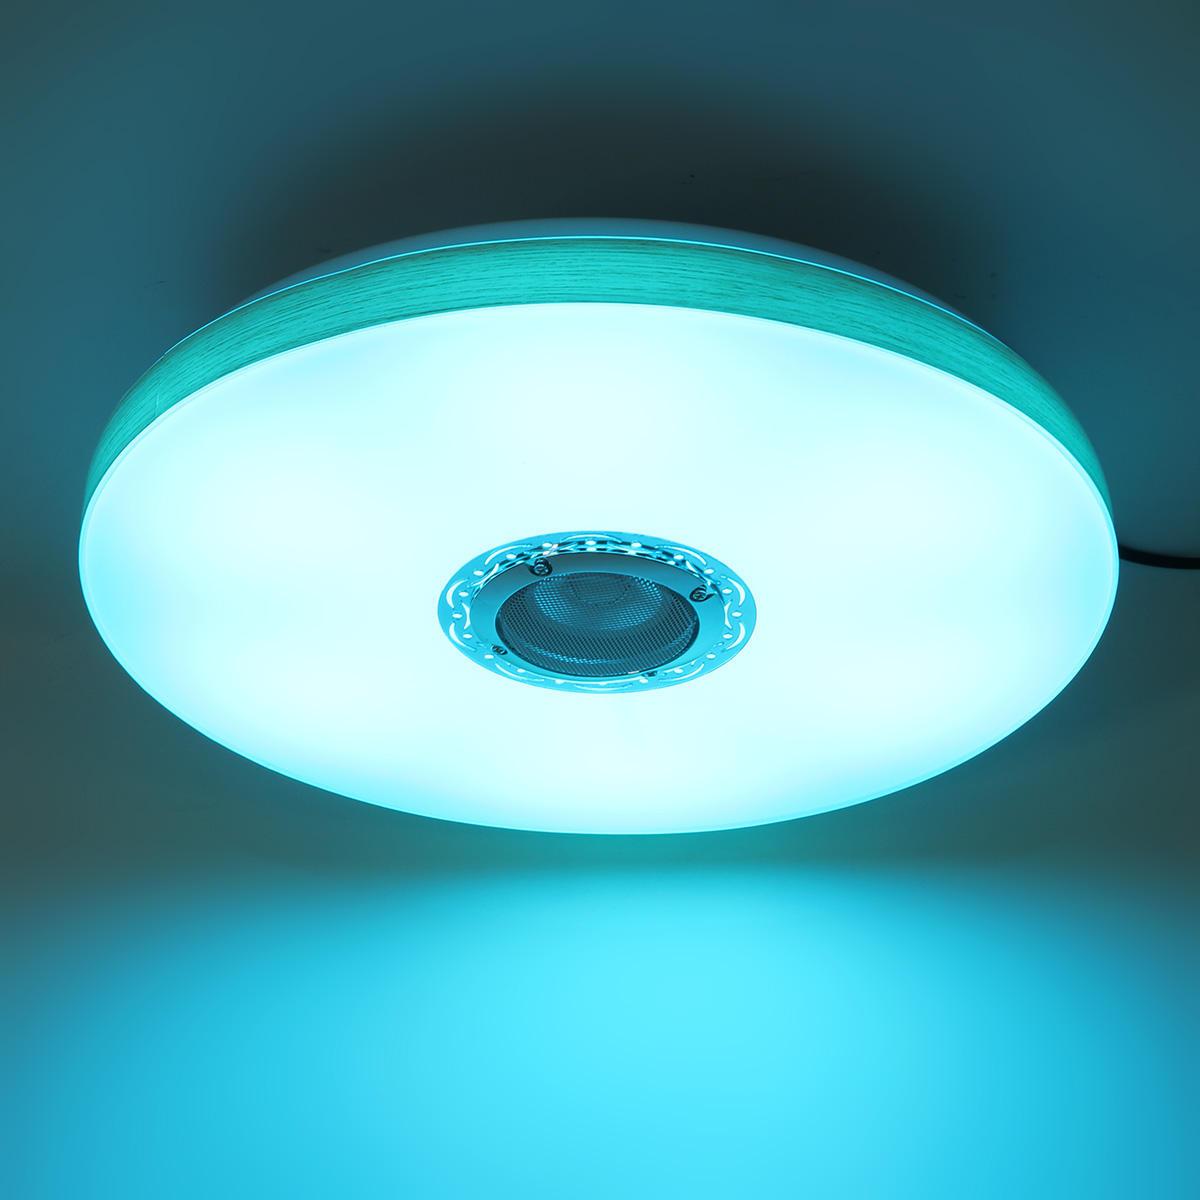 36W RGBW Starlight LED Ceiling Lamp Music Light bluetooth for Bedroom Home AC220V / AC110-240V - 3